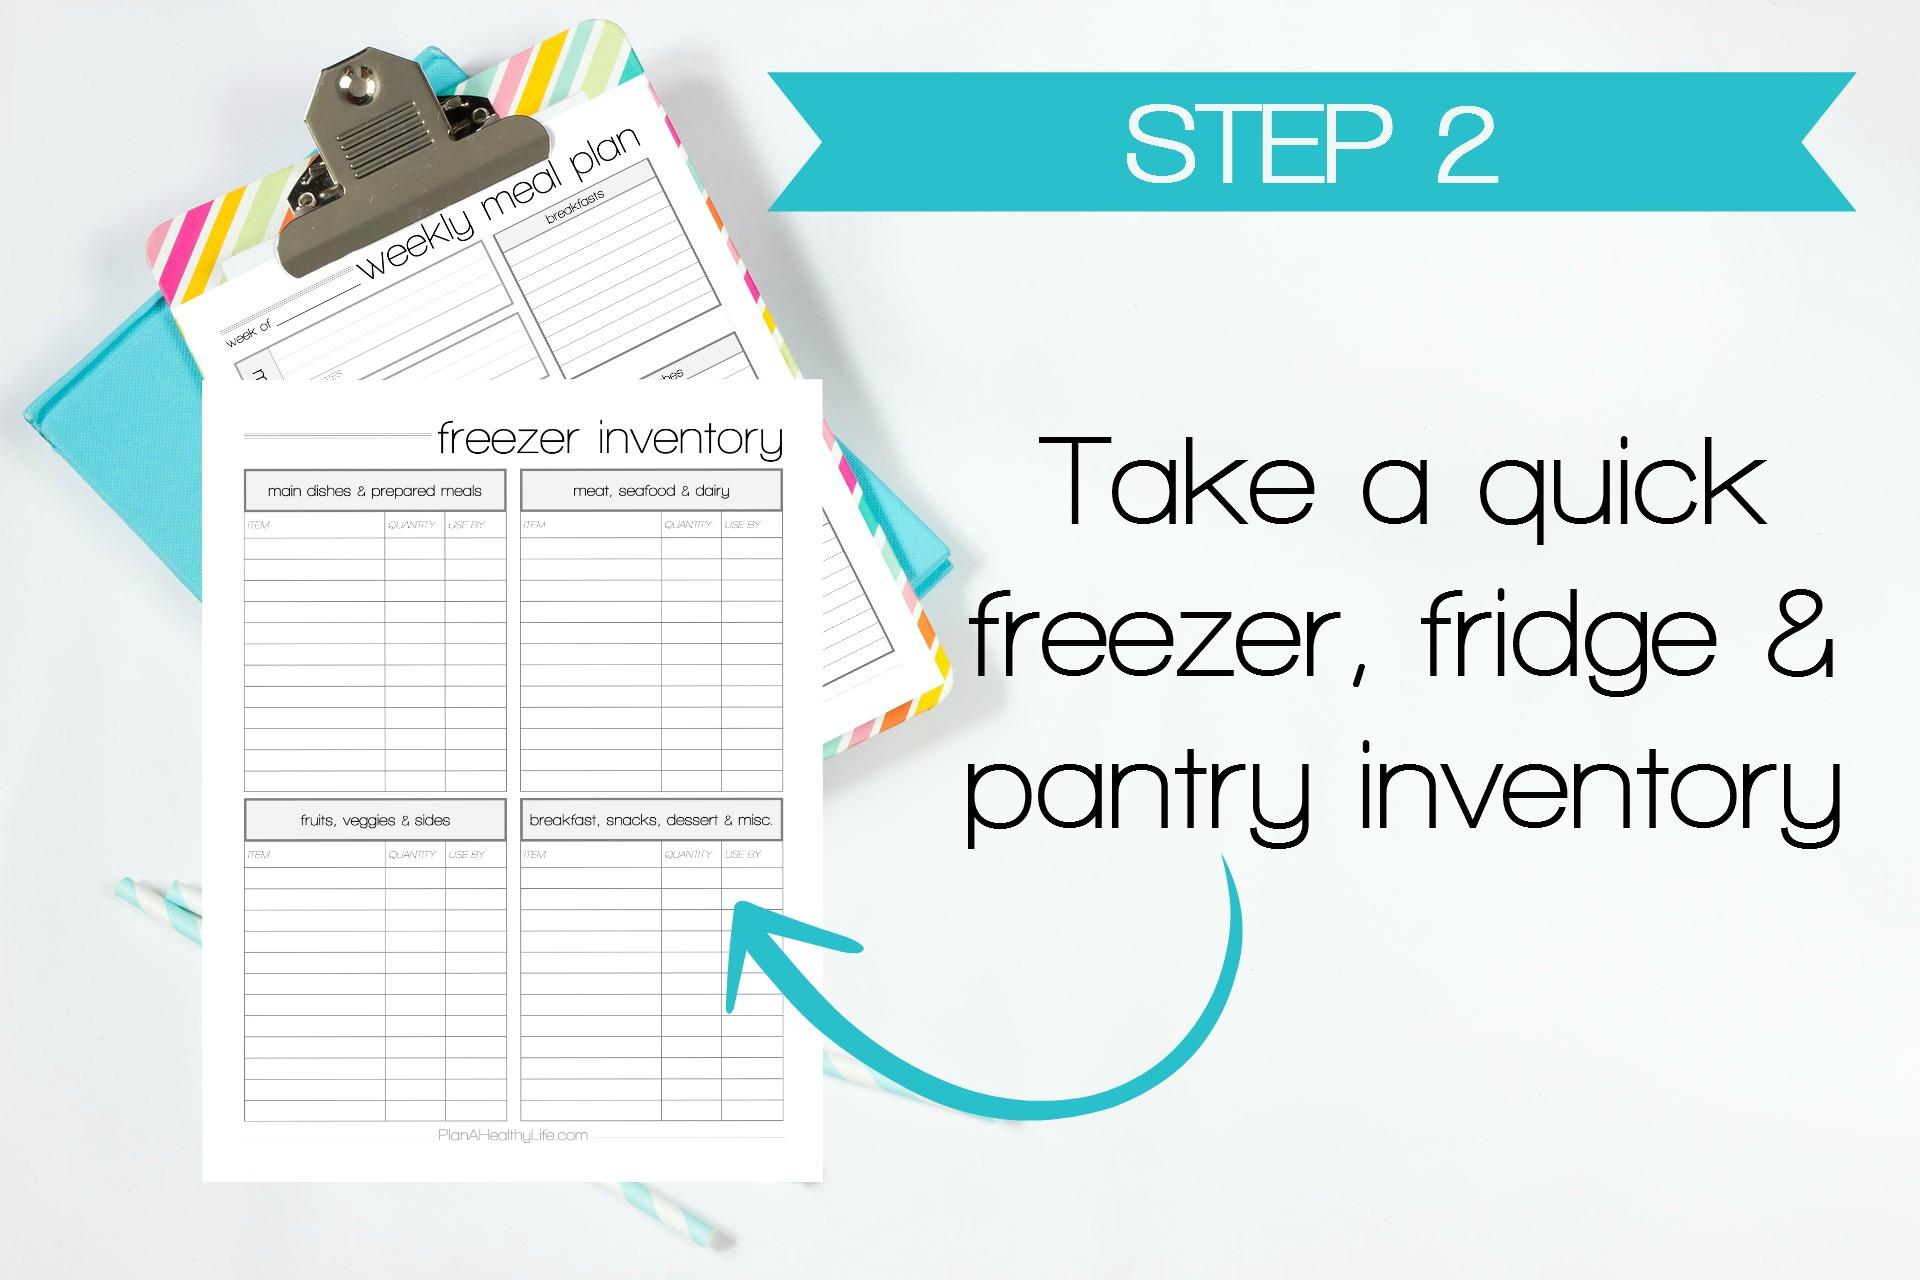 class-step-2-inventory.jpg